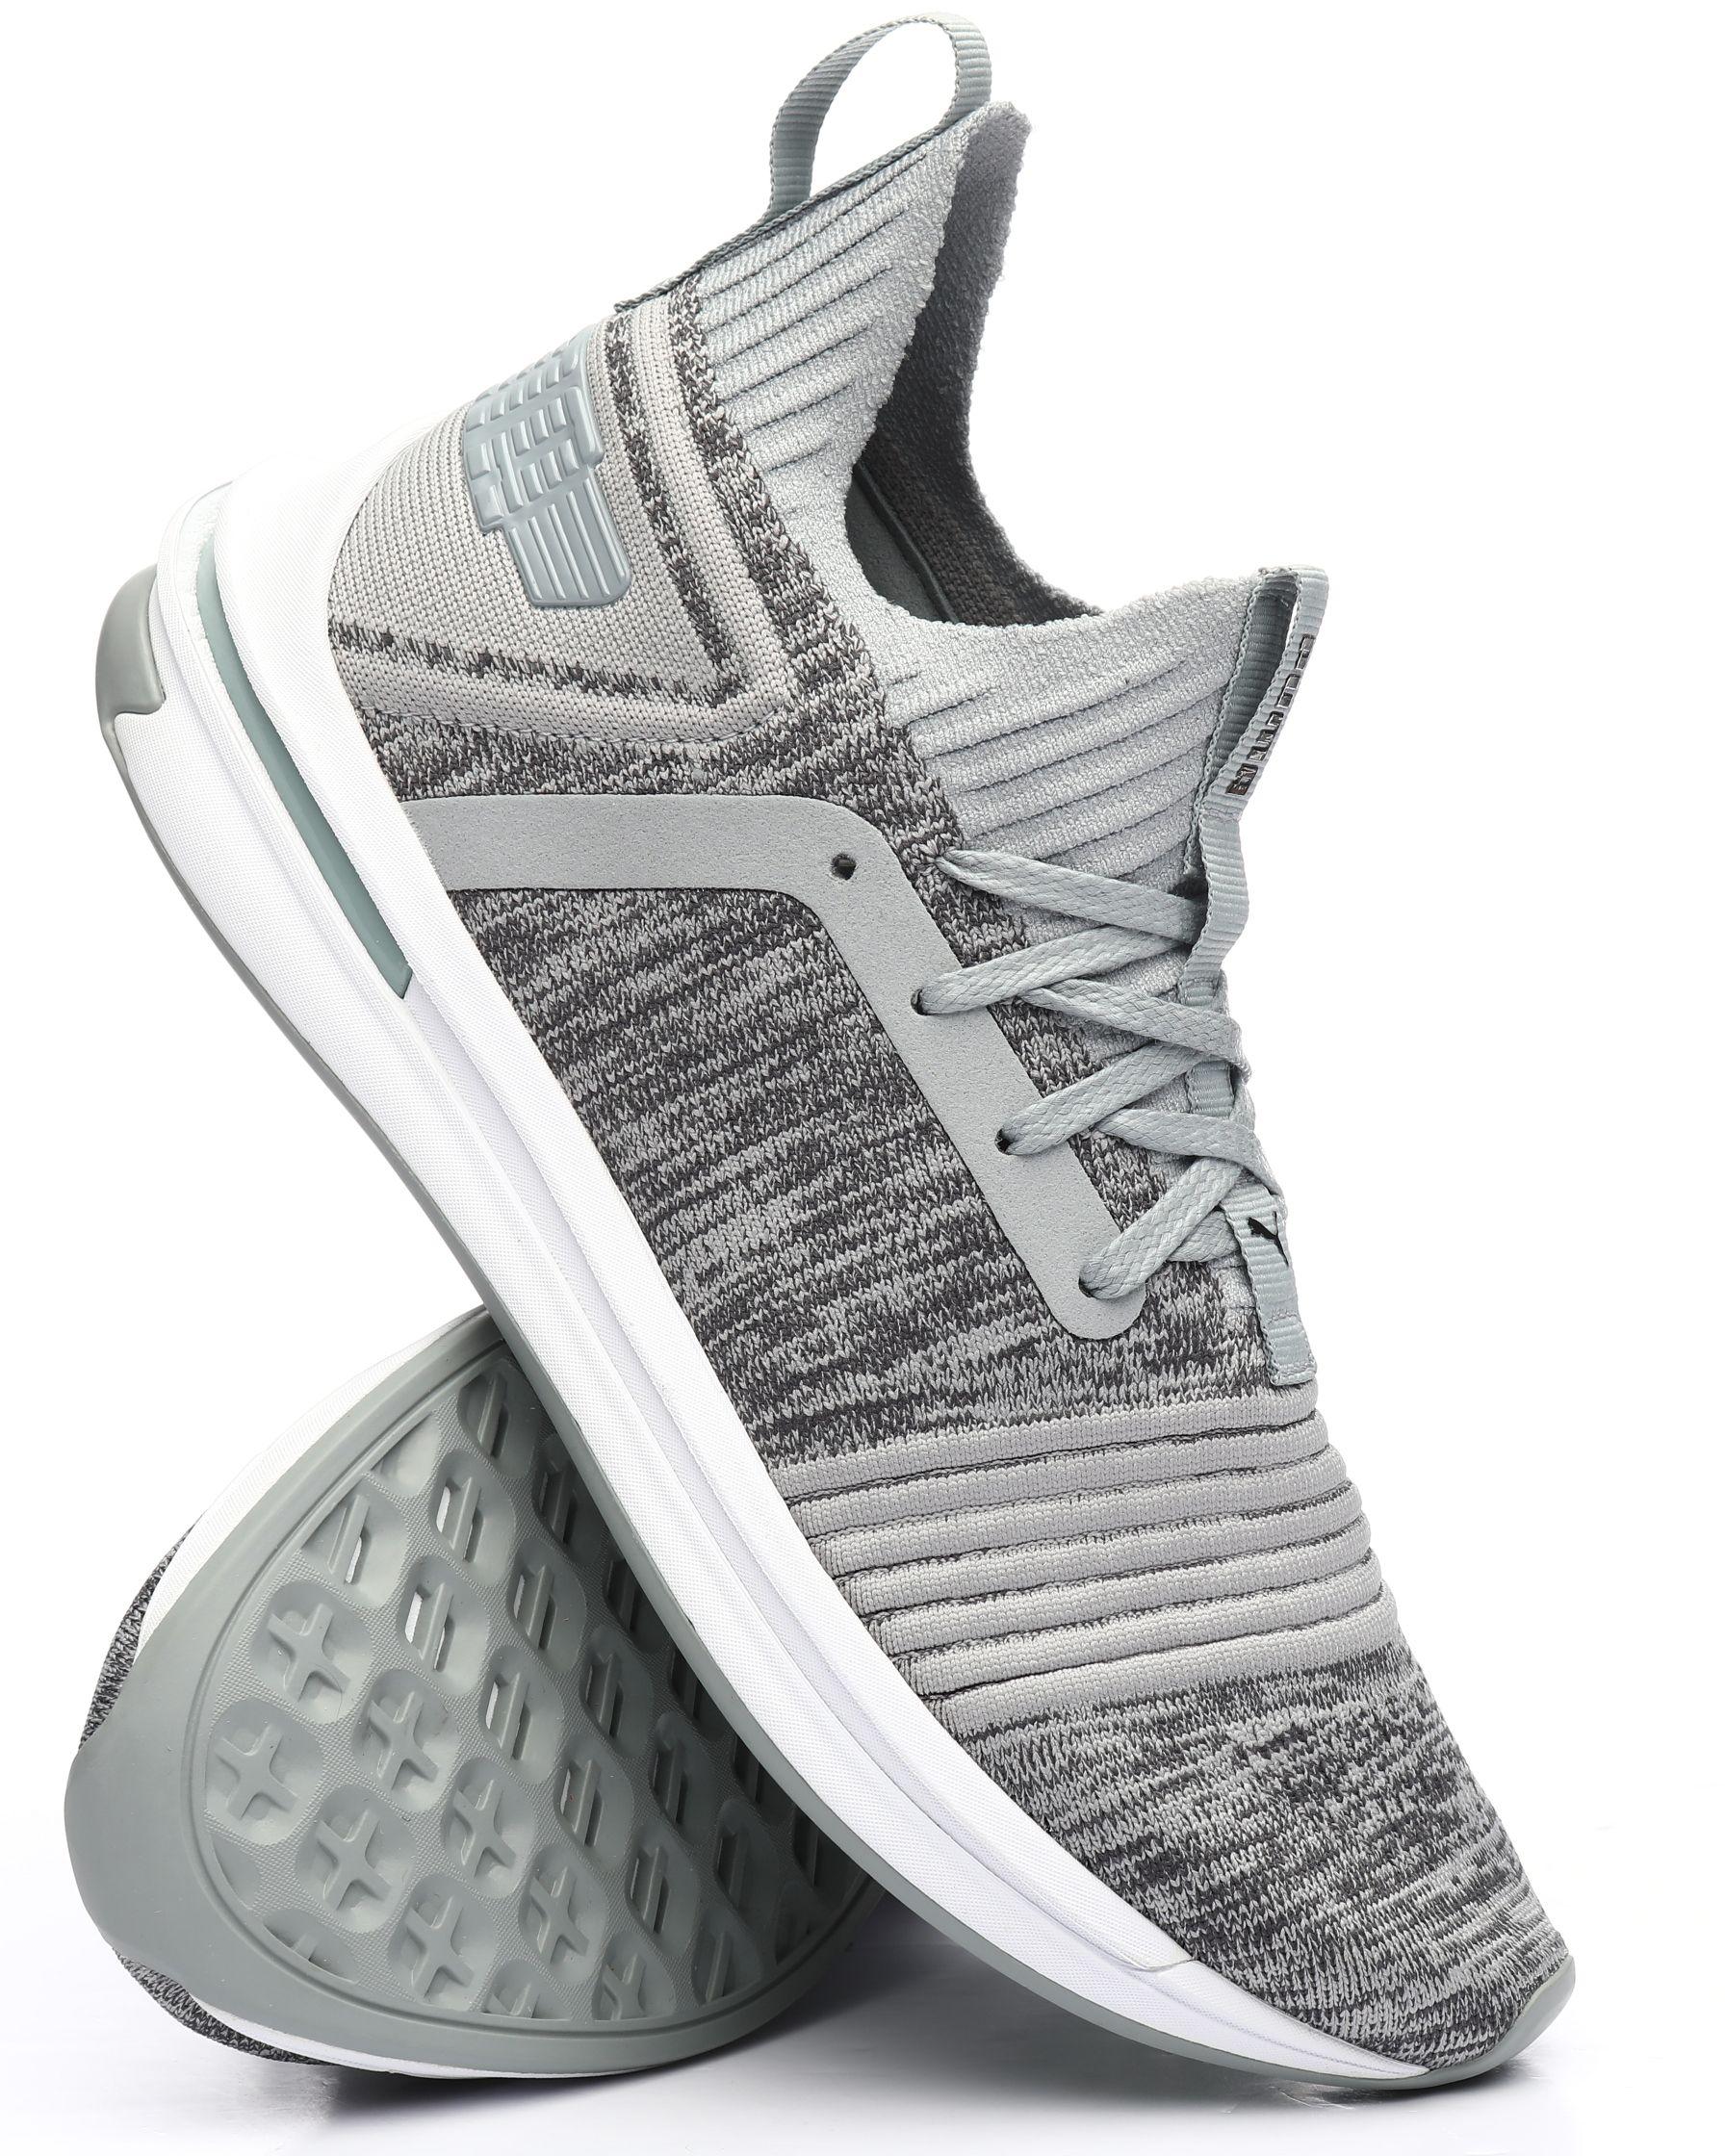 44292629d55475 IGNITE Limitless SR evoKNIT Running Shoes Men s Footwear from Puma. Find  Puma fashion   more at DrJays.com